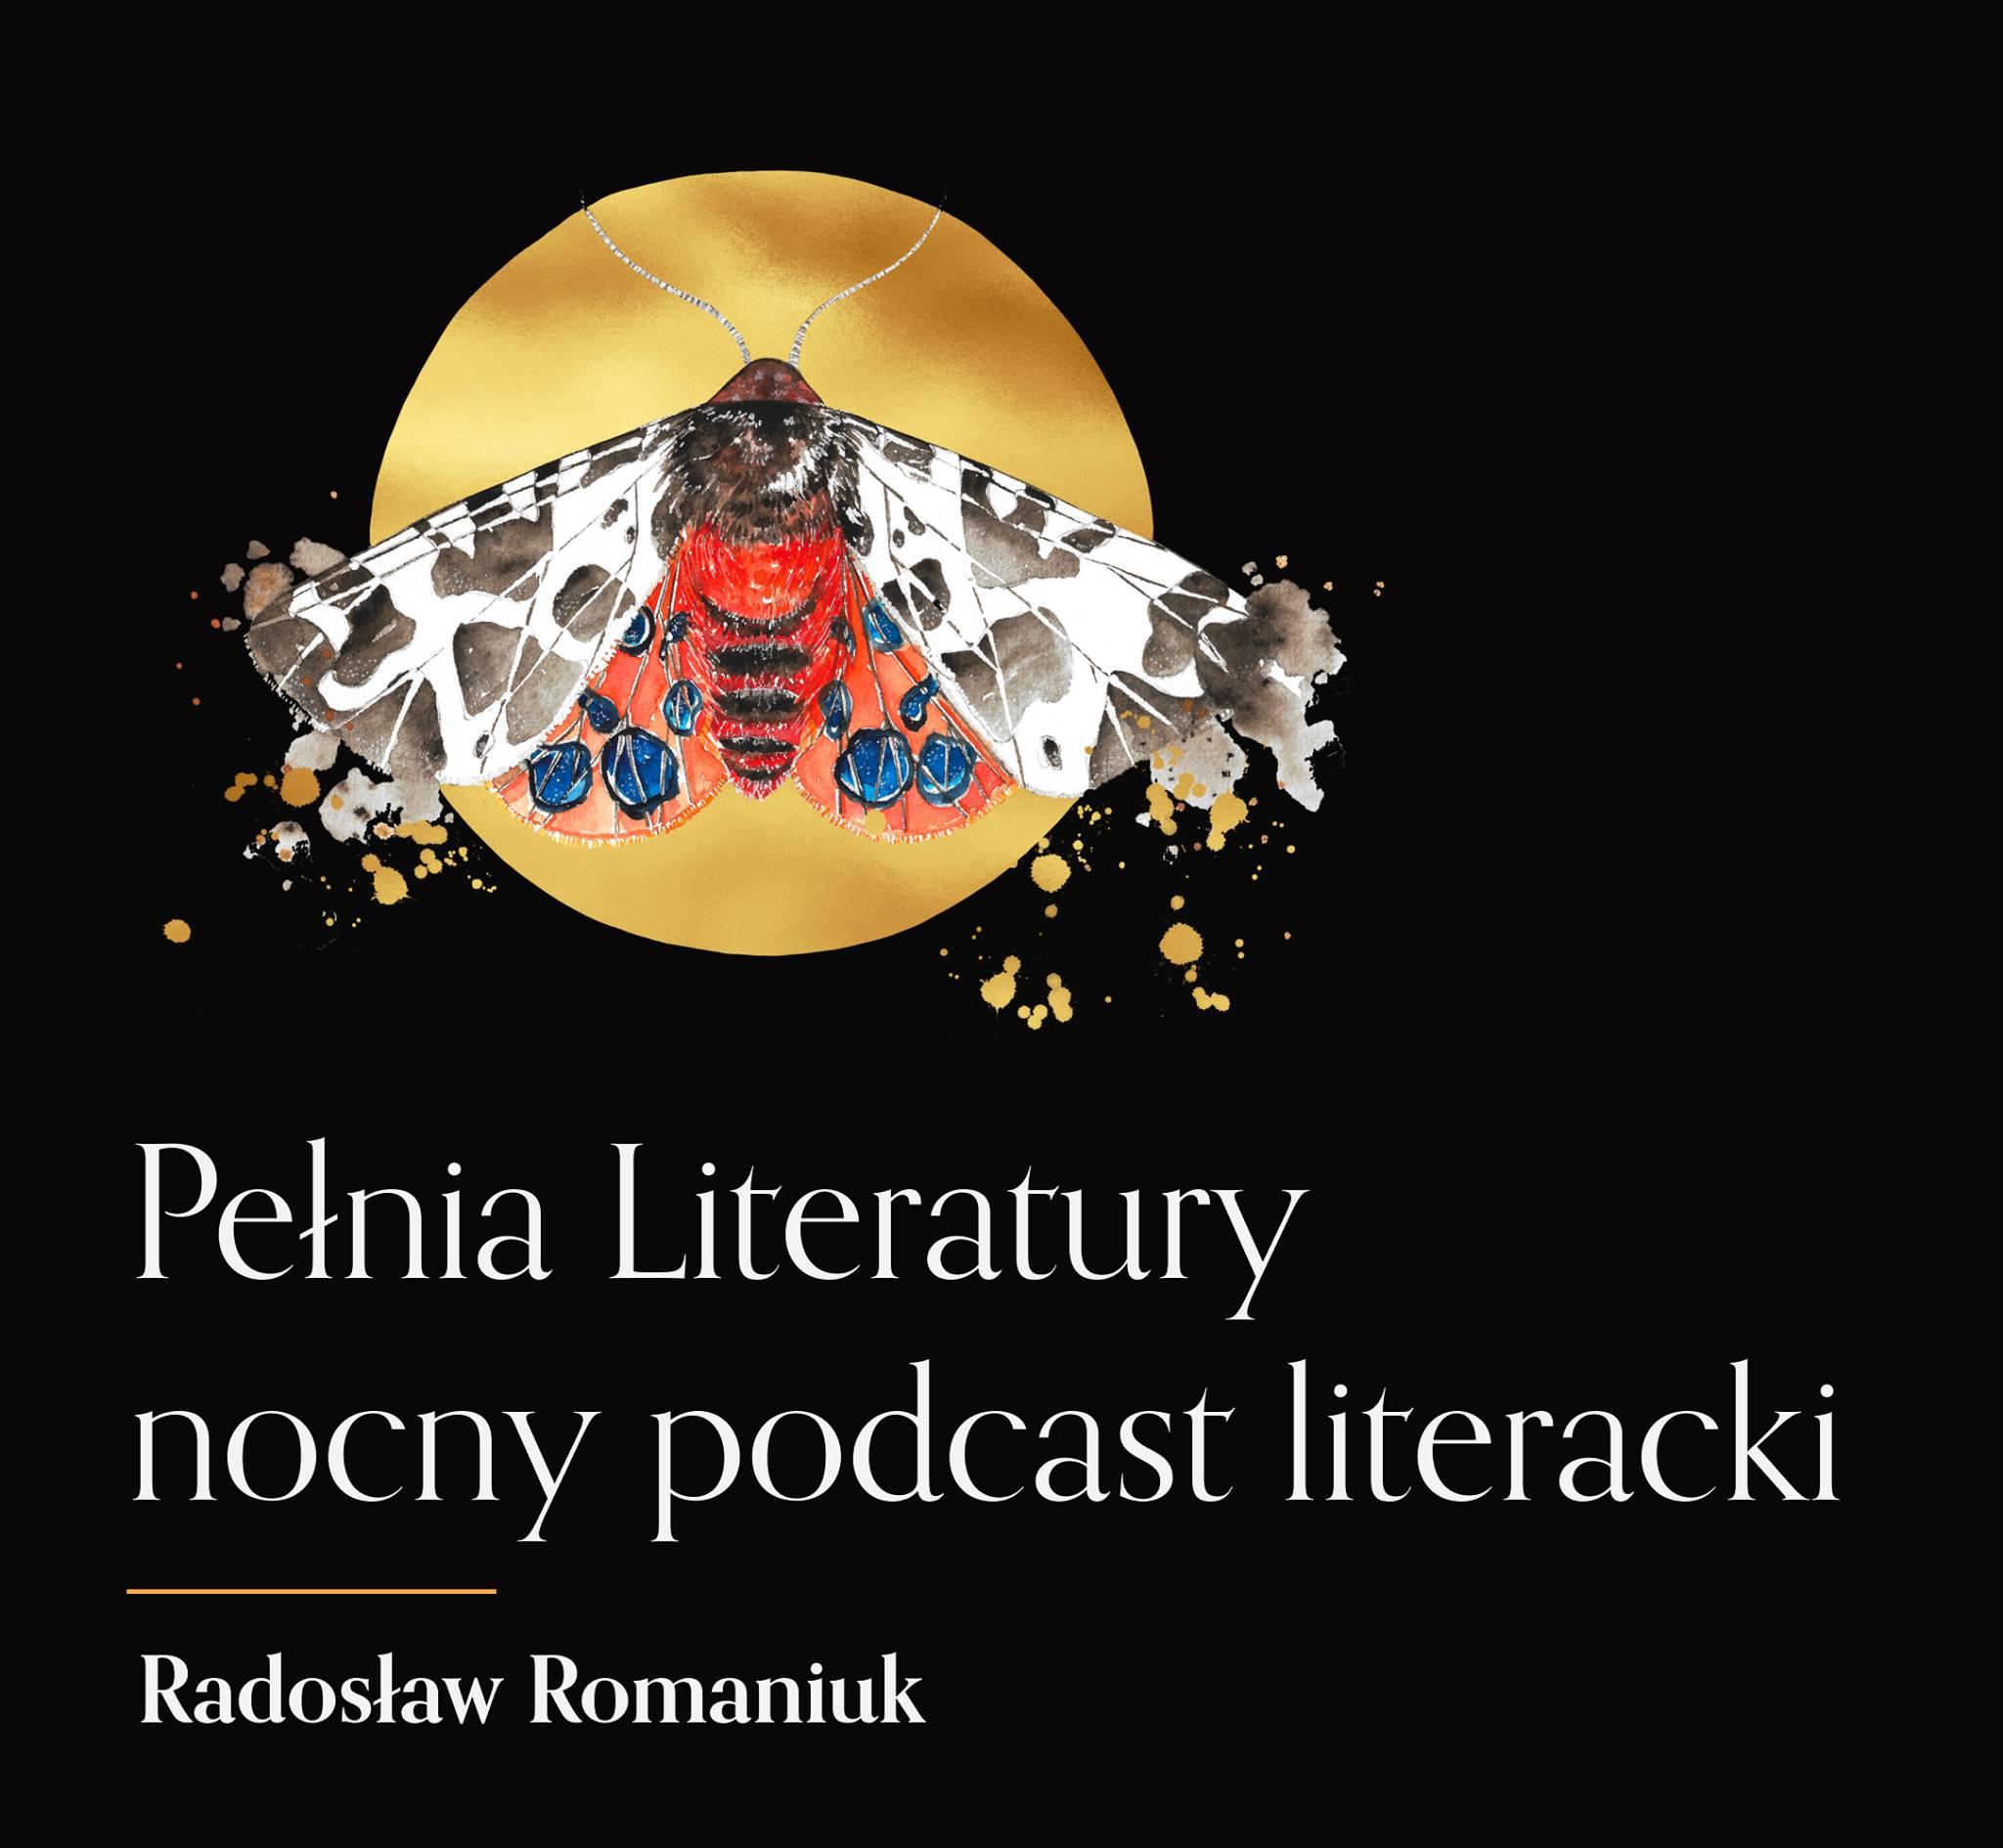 Pełnia Literatury Nocny podcast literacki